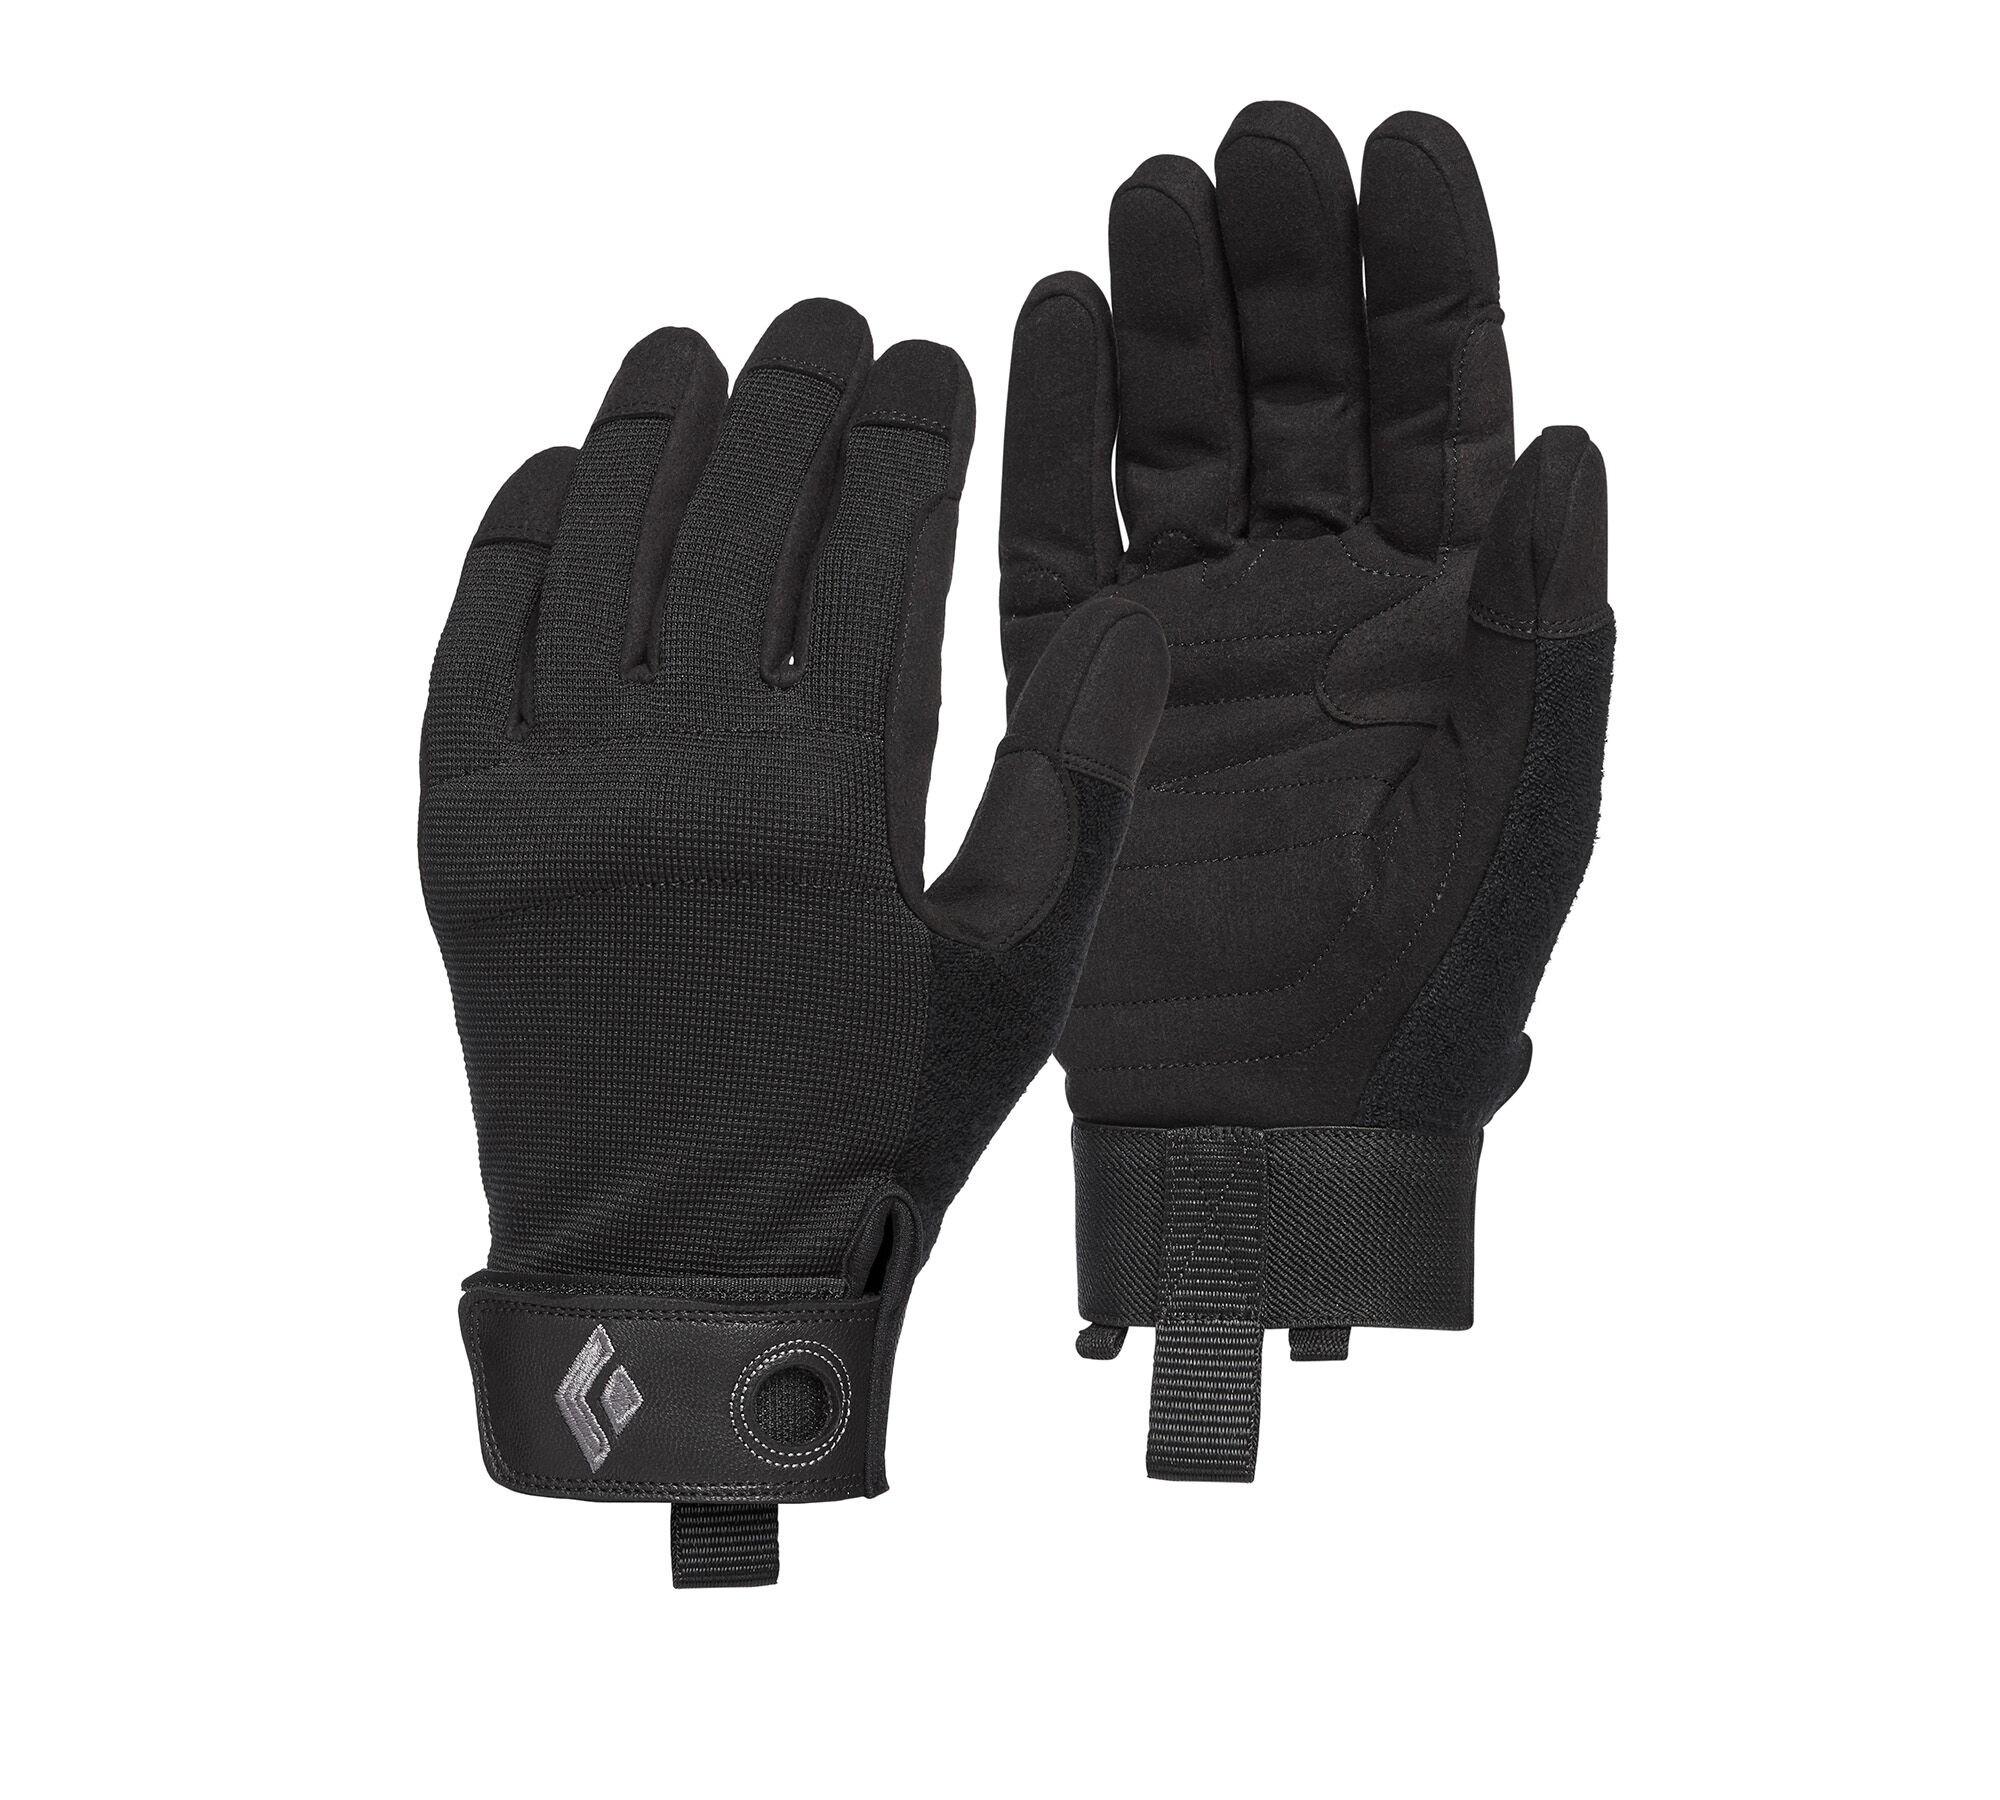 Black Diamond Crag Gloves - Climbing gloves